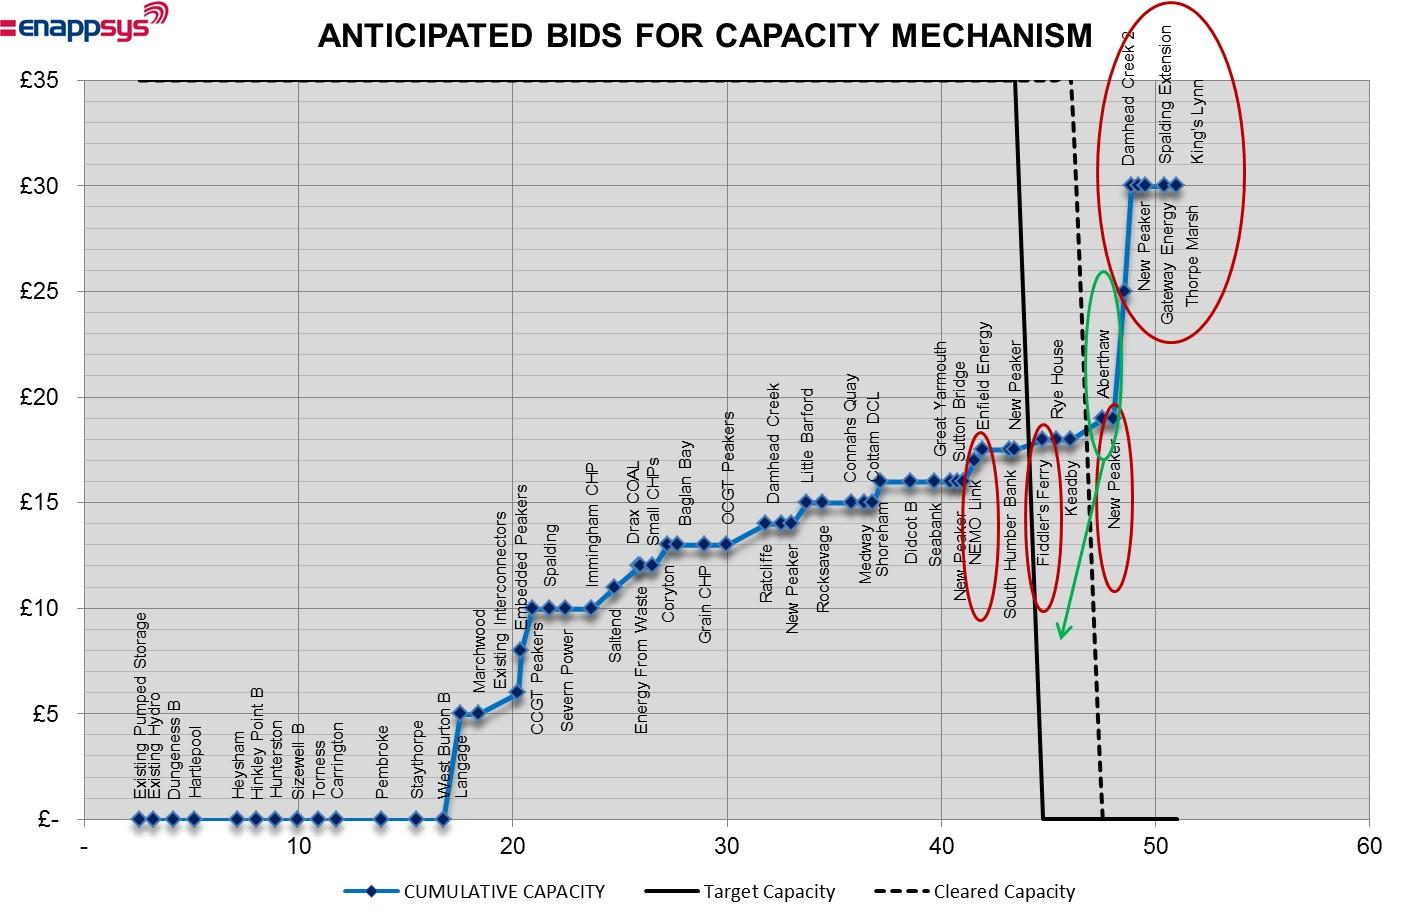 Bids for Capacity Mechanism